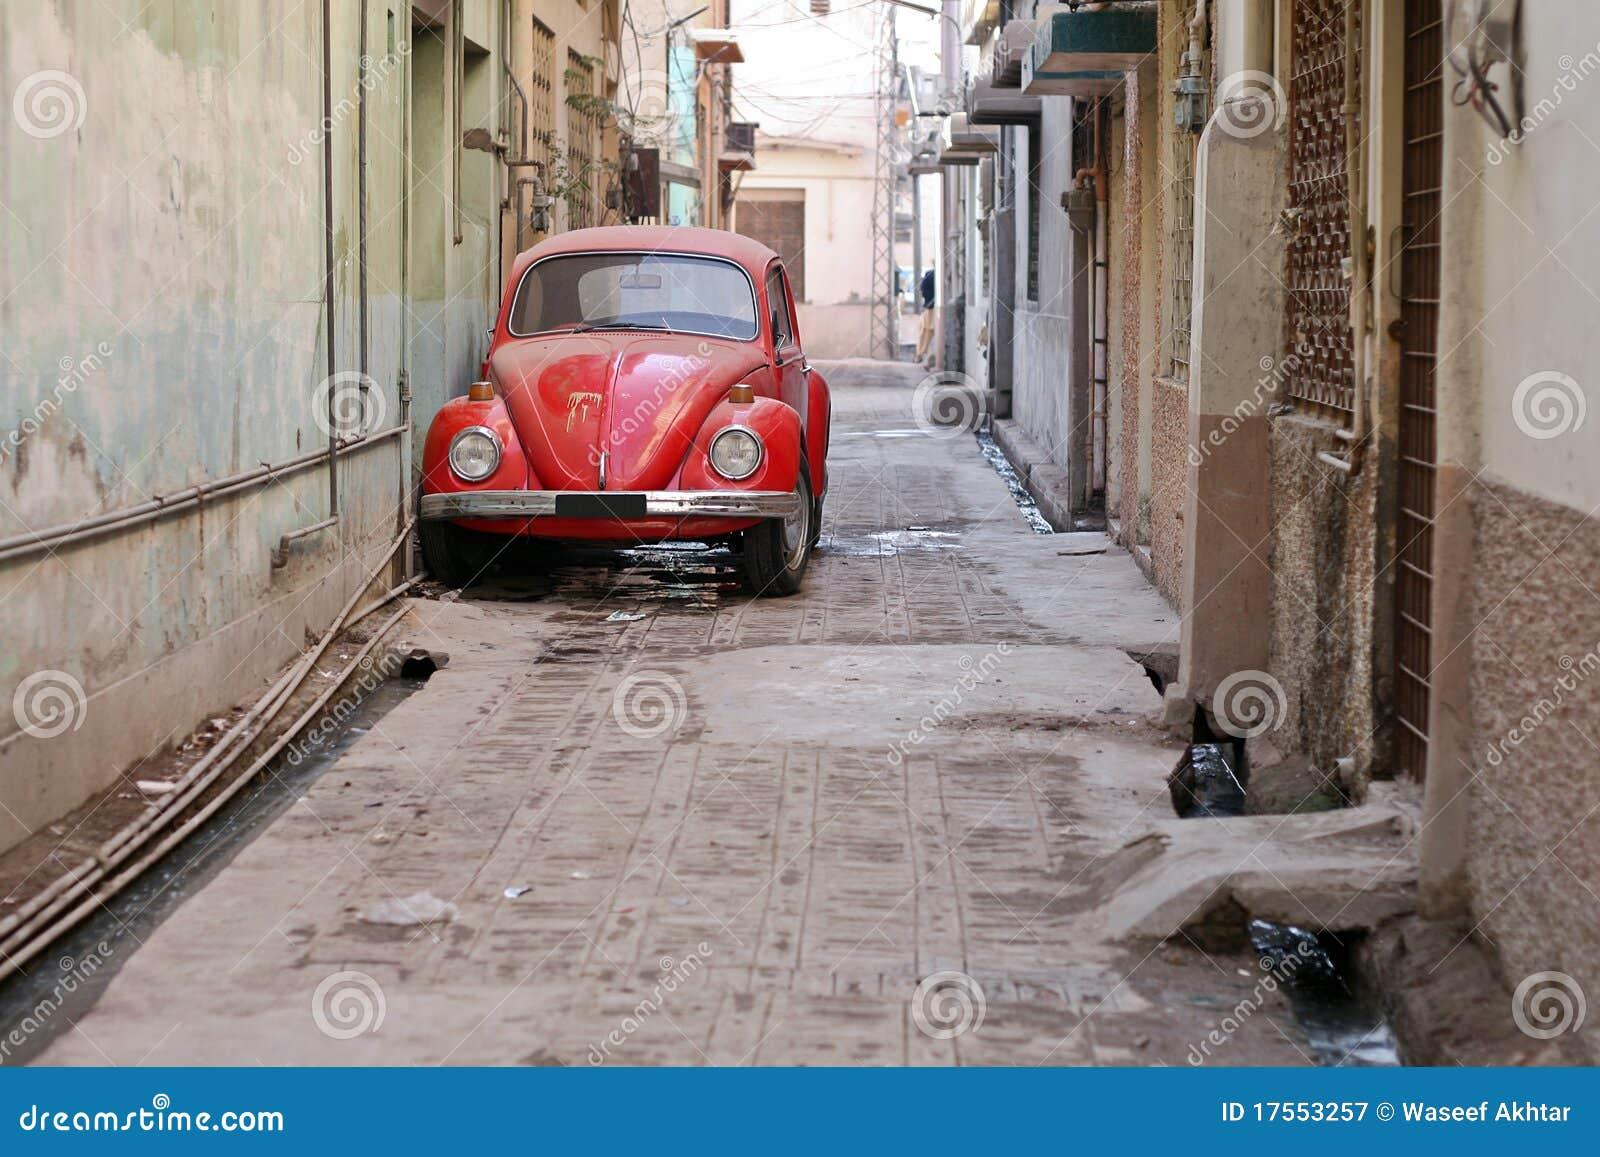 rotes altes auto stockbild bild von wiederbelebung outdoor 17553257. Black Bedroom Furniture Sets. Home Design Ideas